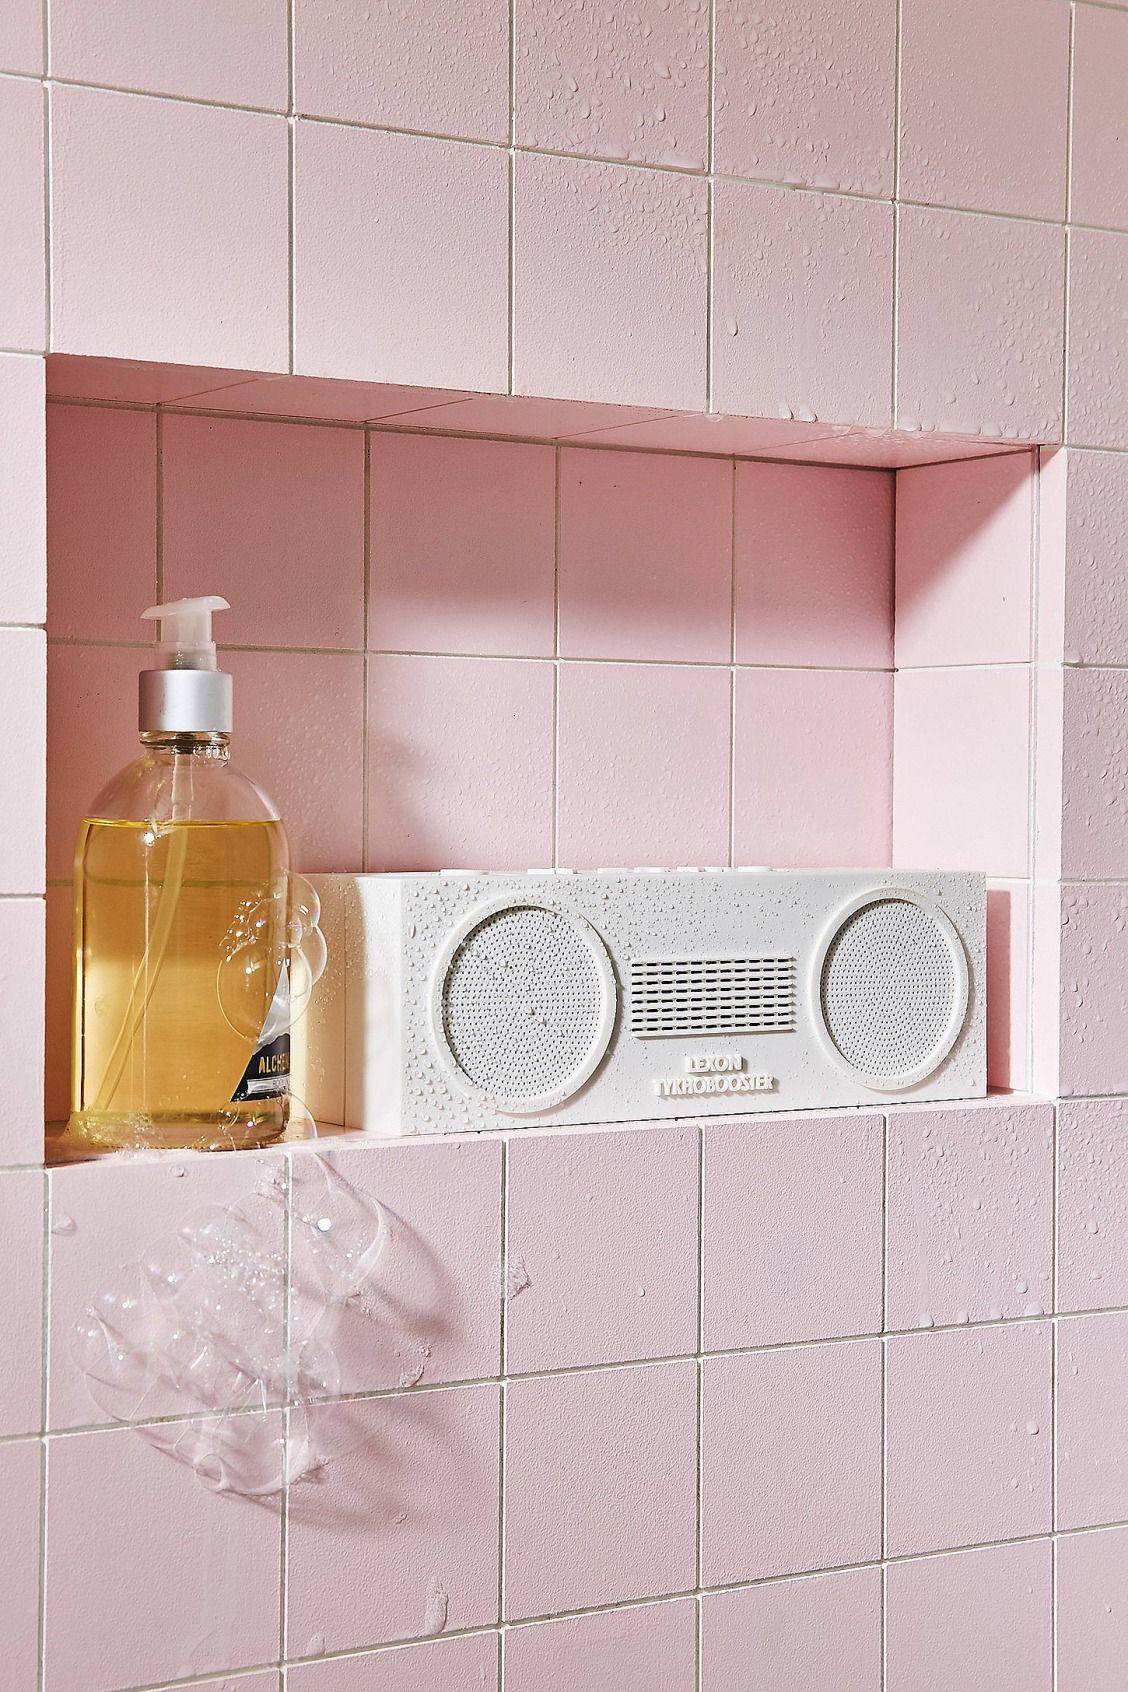 Lexon Tykho Booster White Water Resistant Bluetooth Wireless Speaker Lautsprecher Bluetooth Lautsprecher Und Bluetooth